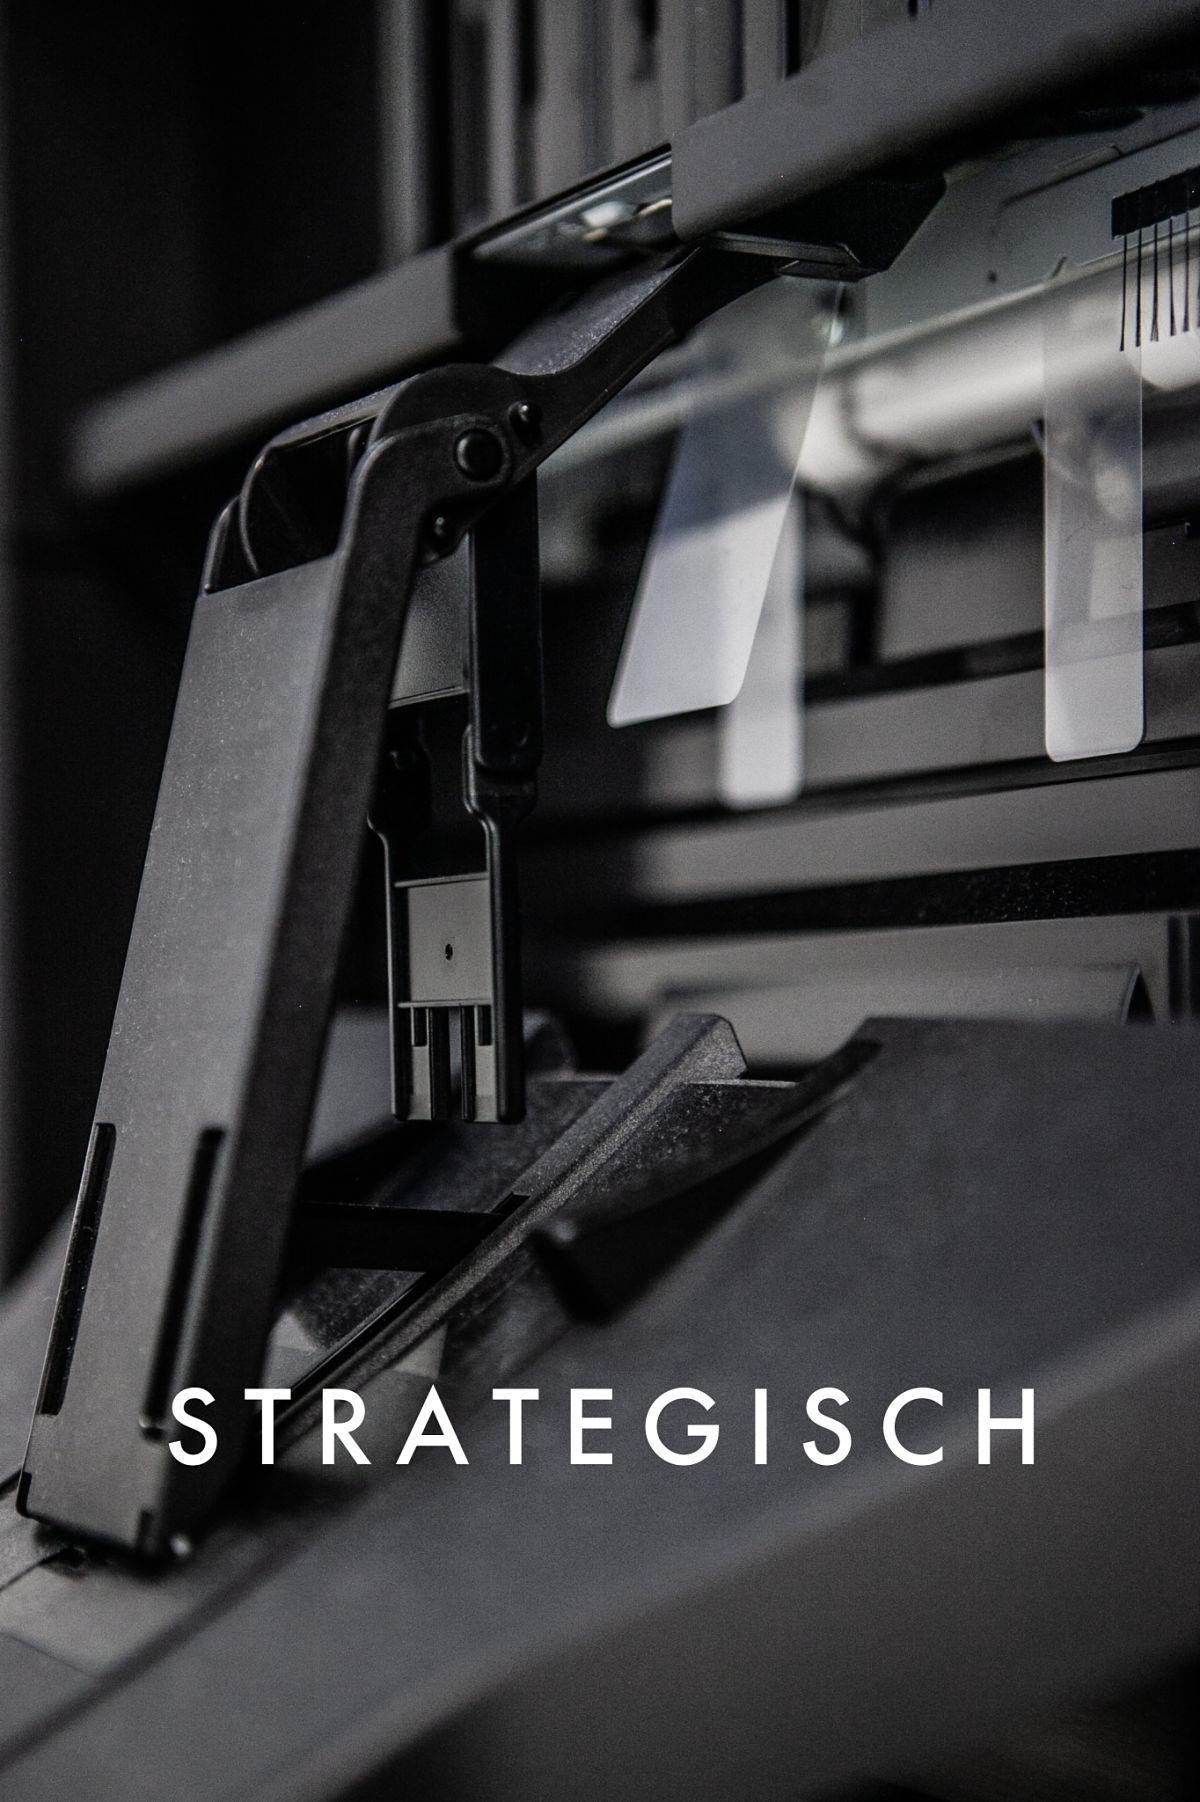 duo_leistungen_strategisch_opt.jpg